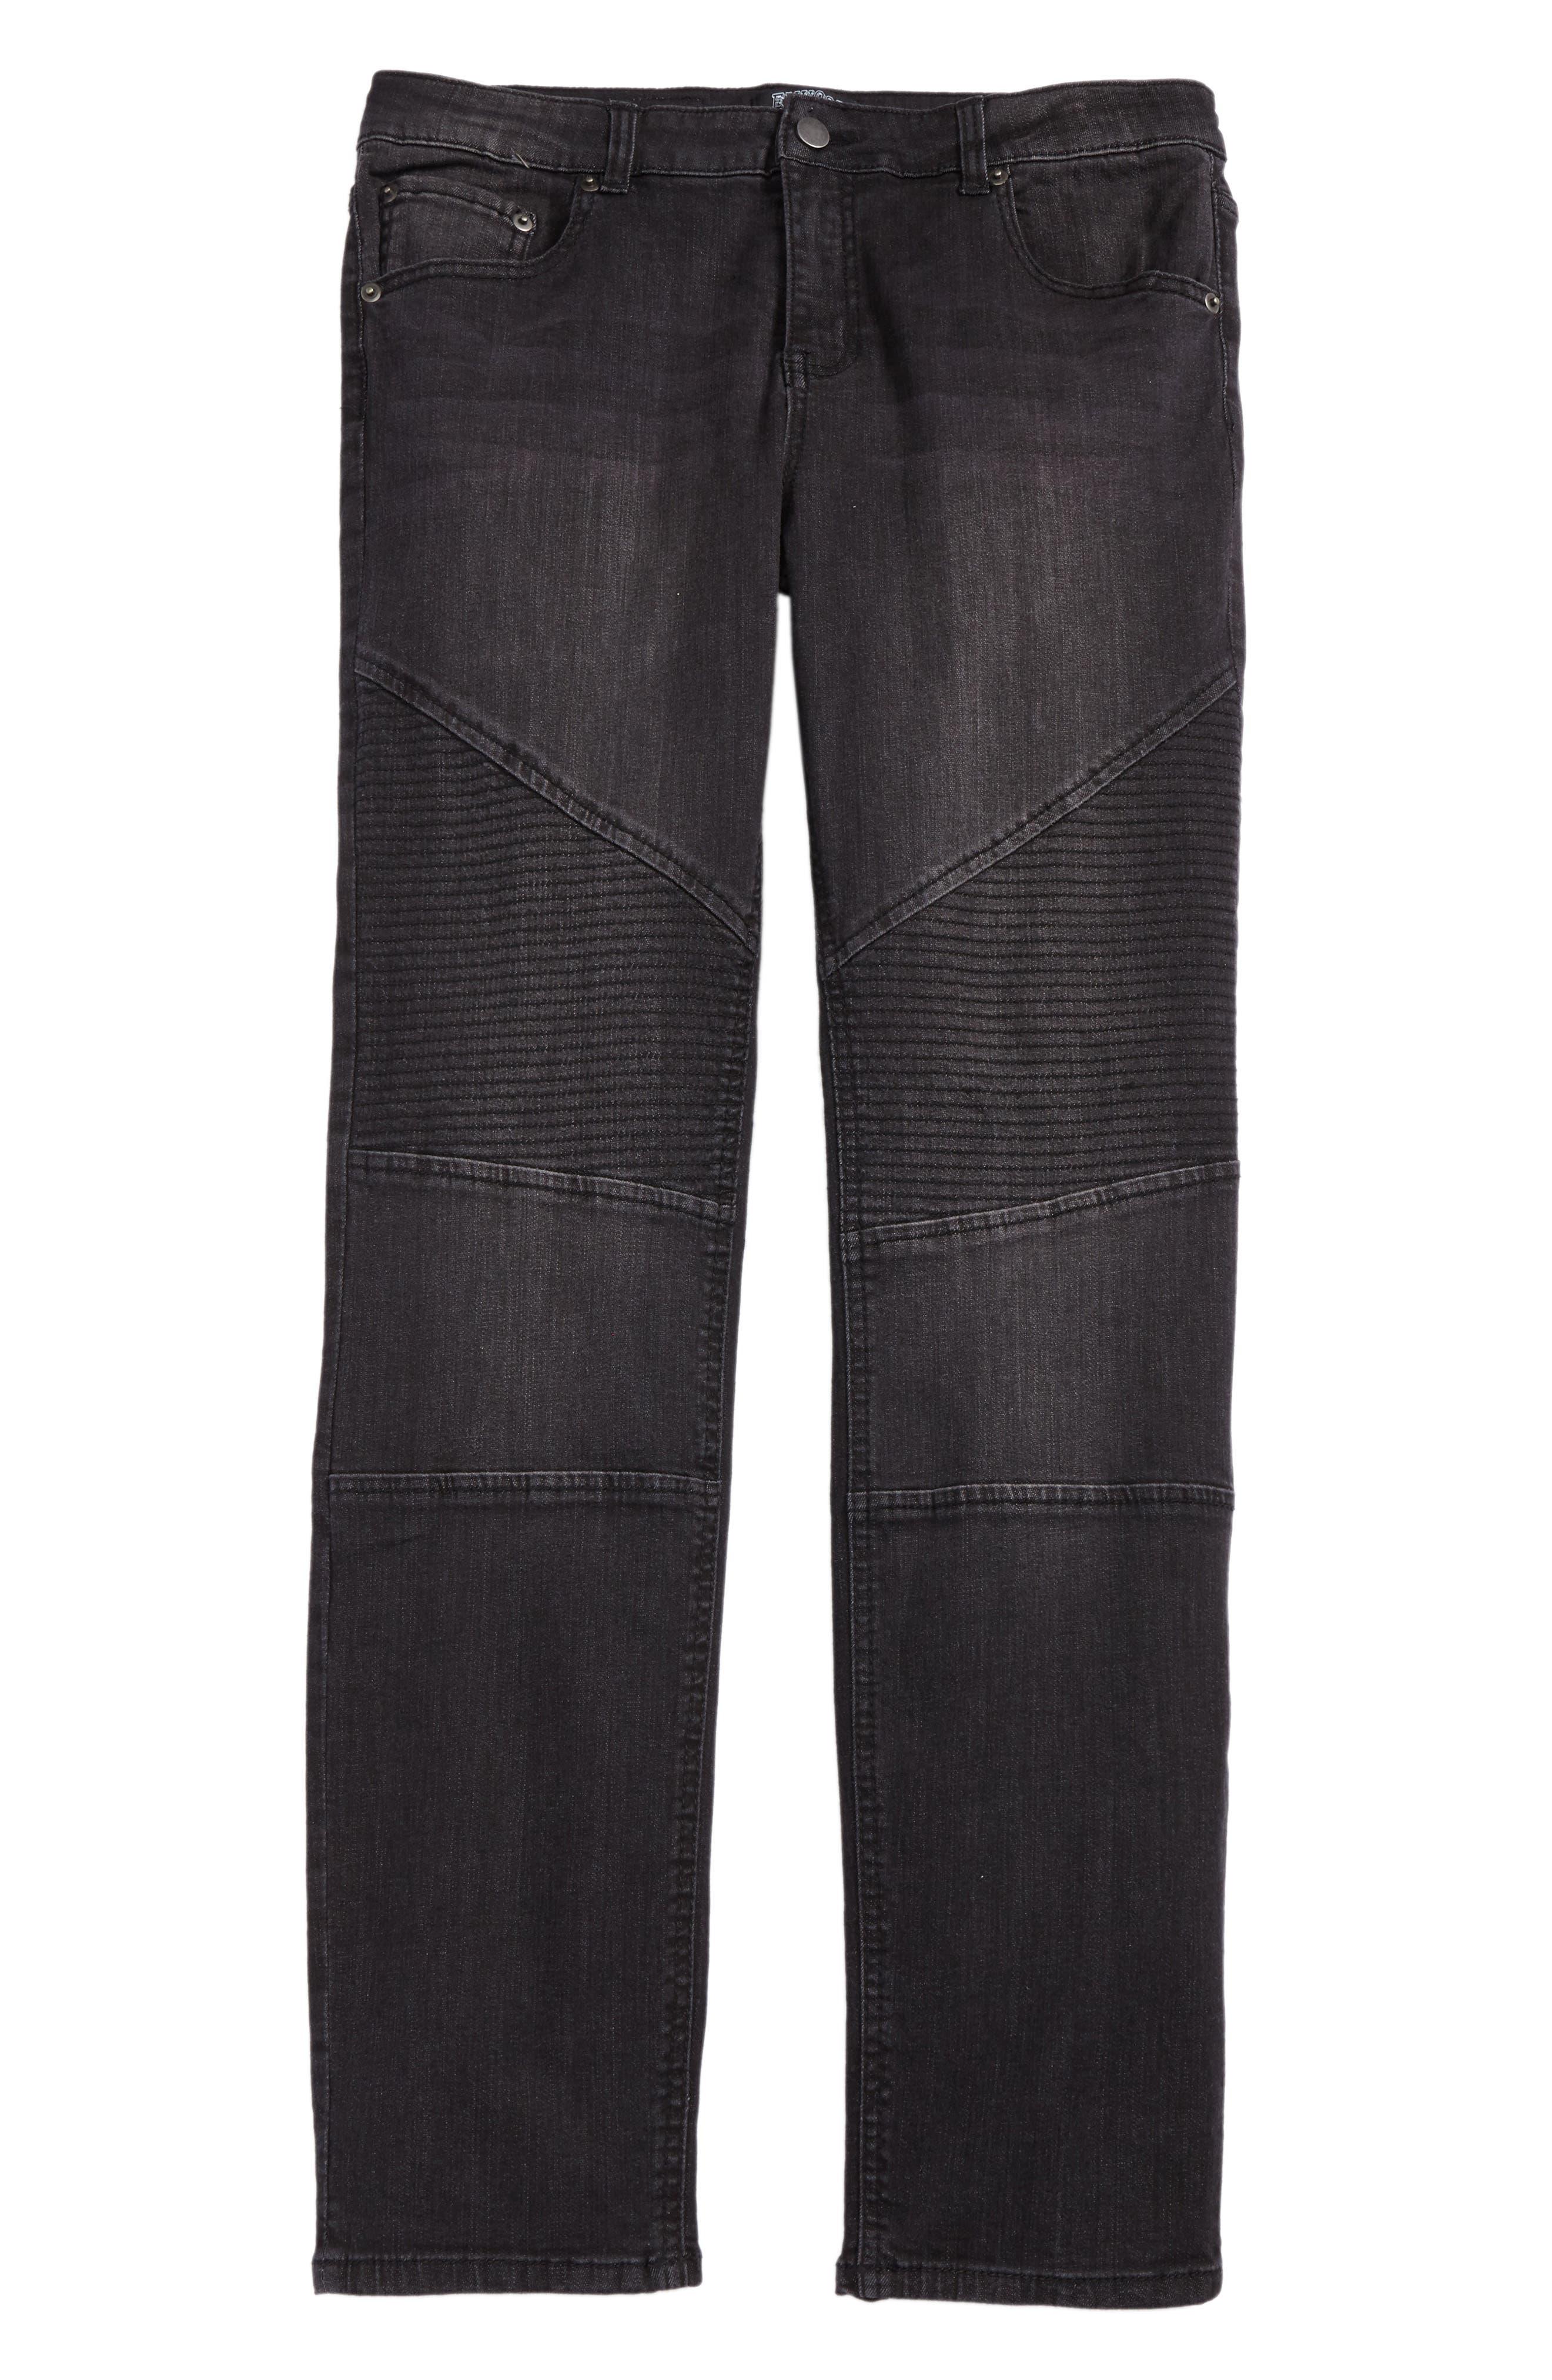 Alternate Image 1 Selected - Elwood Straight Leg Moto Jeans (Big Boys)